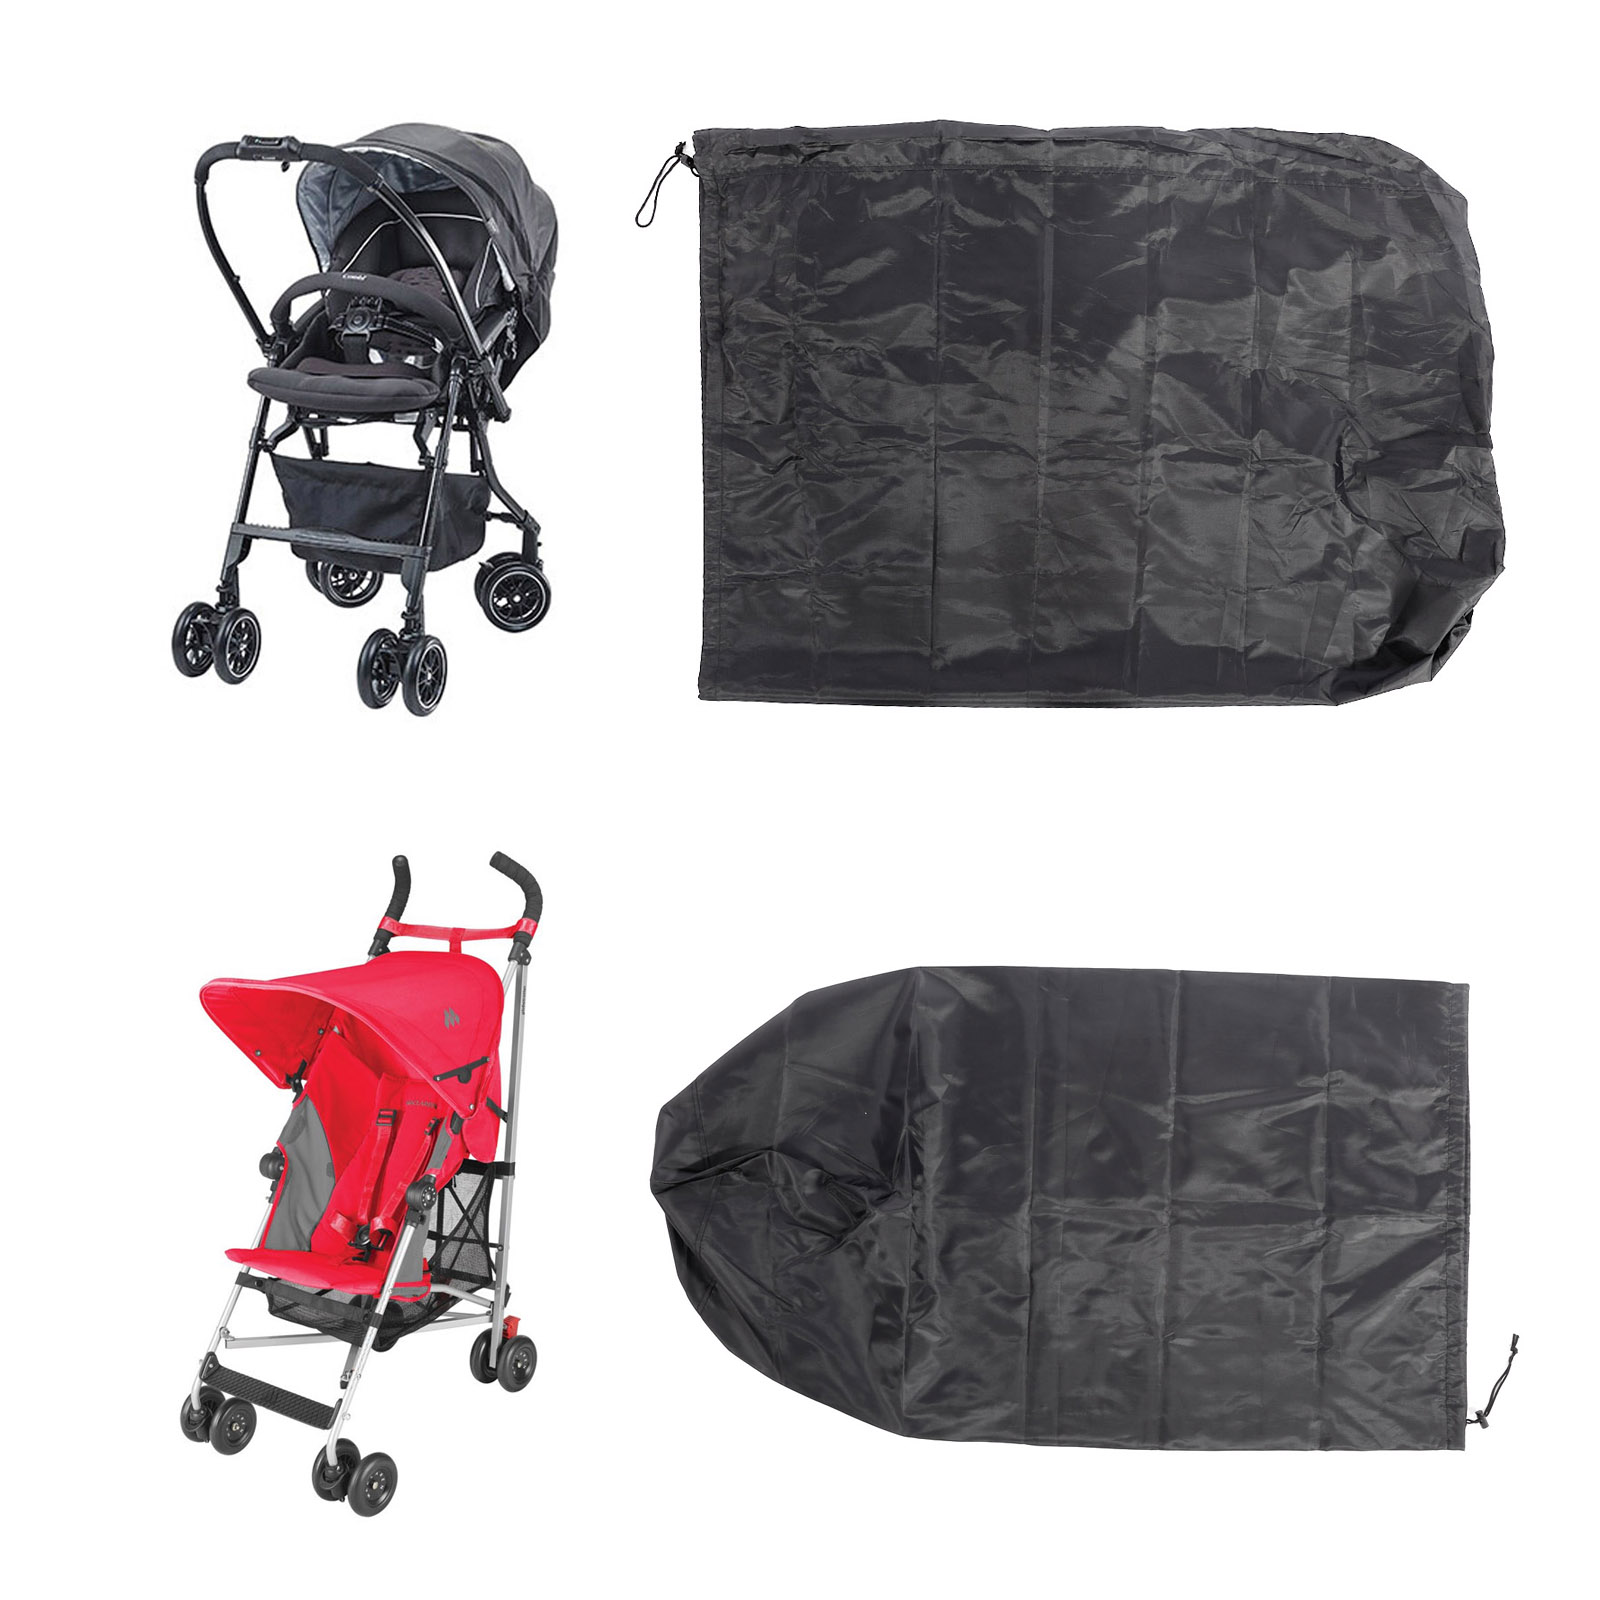 getr nkeflasche flasche halter baby kinder buggy organizer. Black Bedroom Furniture Sets. Home Design Ideas